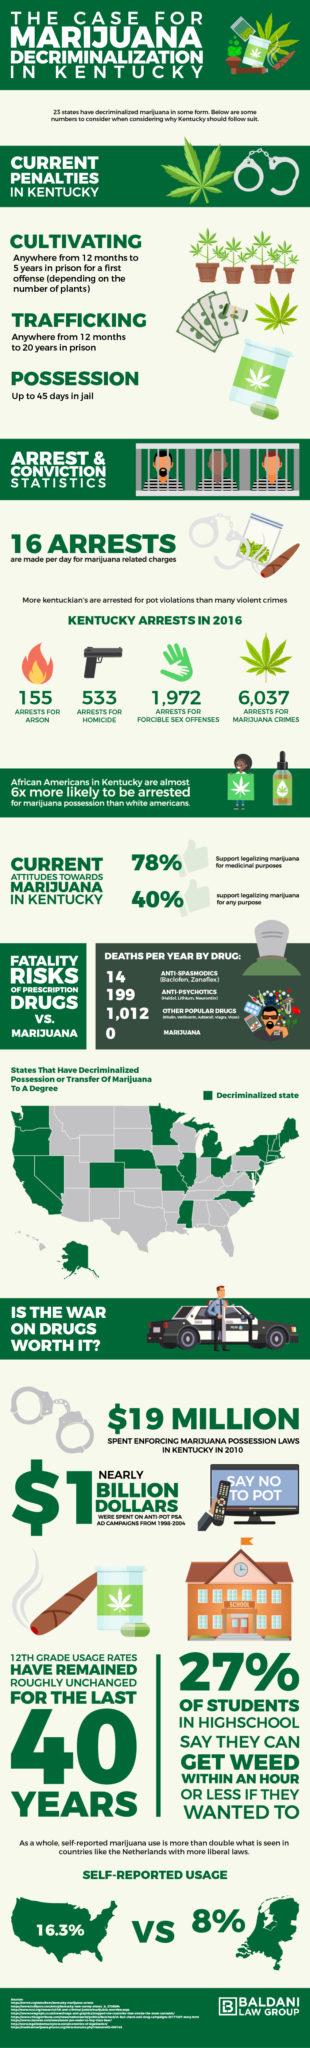 Kentucky Marijuana Decriminalization Infographic